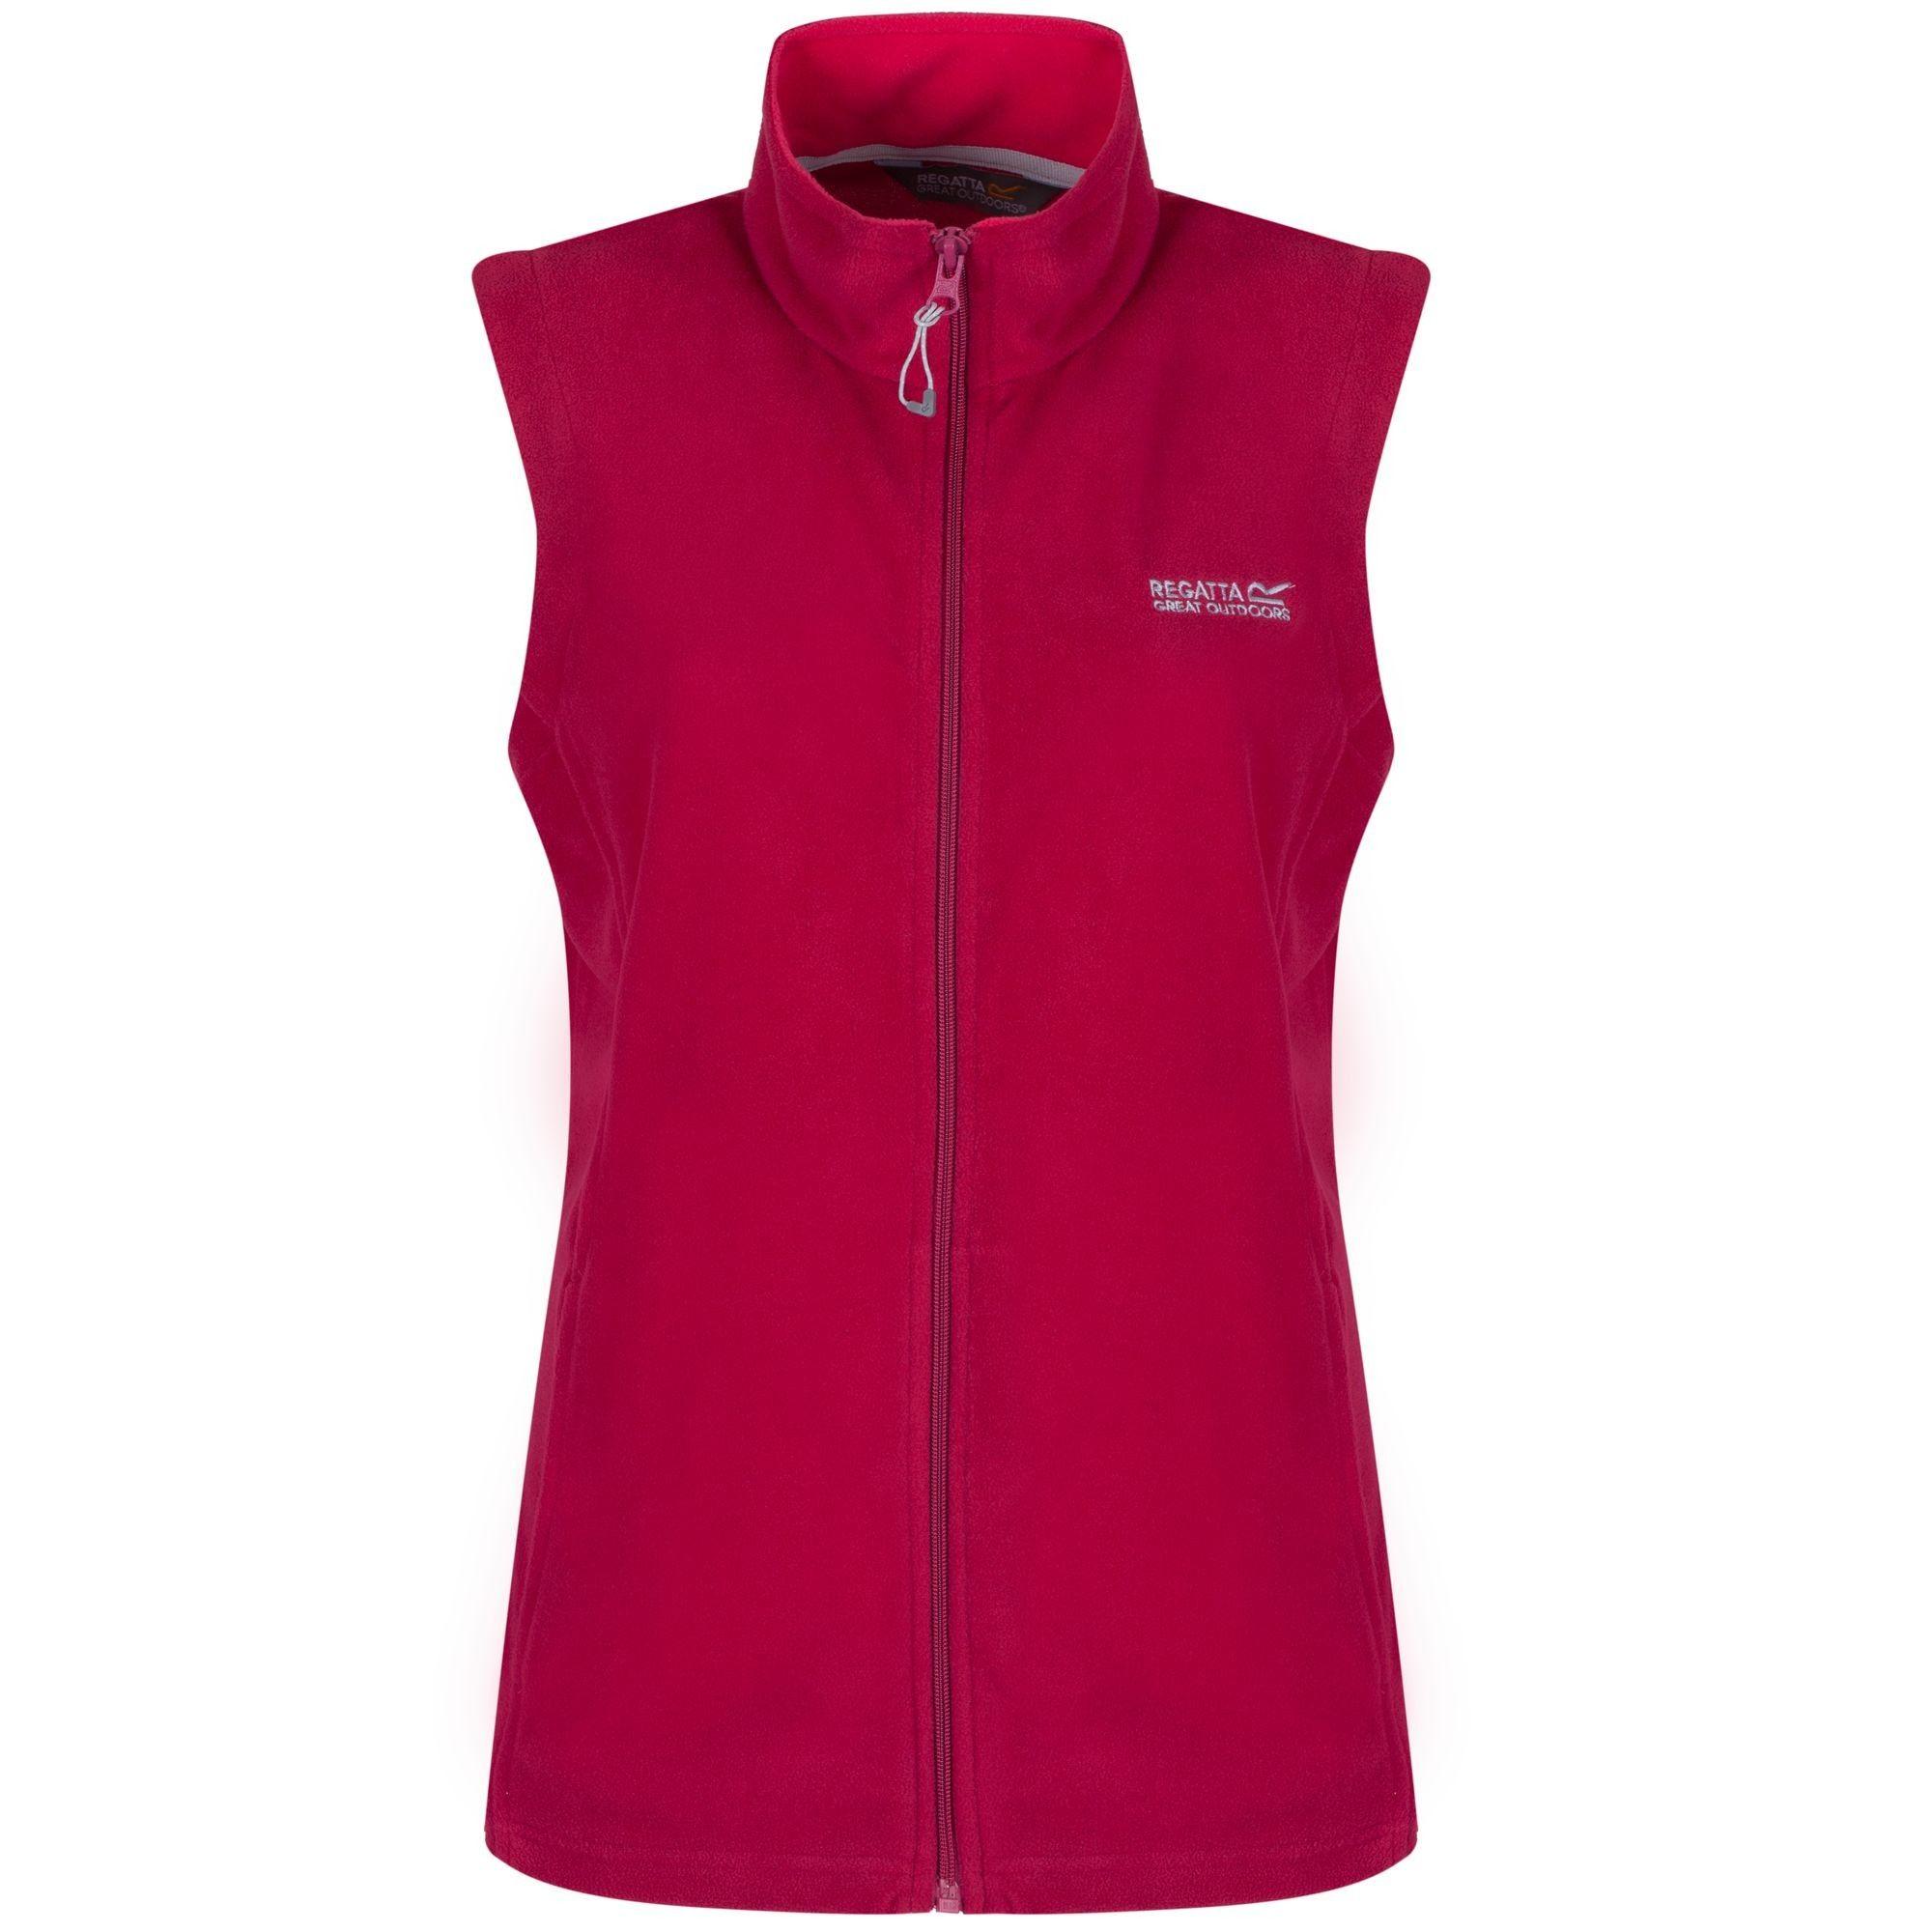 Regatta Great Outdoors Womens/Ladies Outdoor Classics Sweetness II Bodywarmer